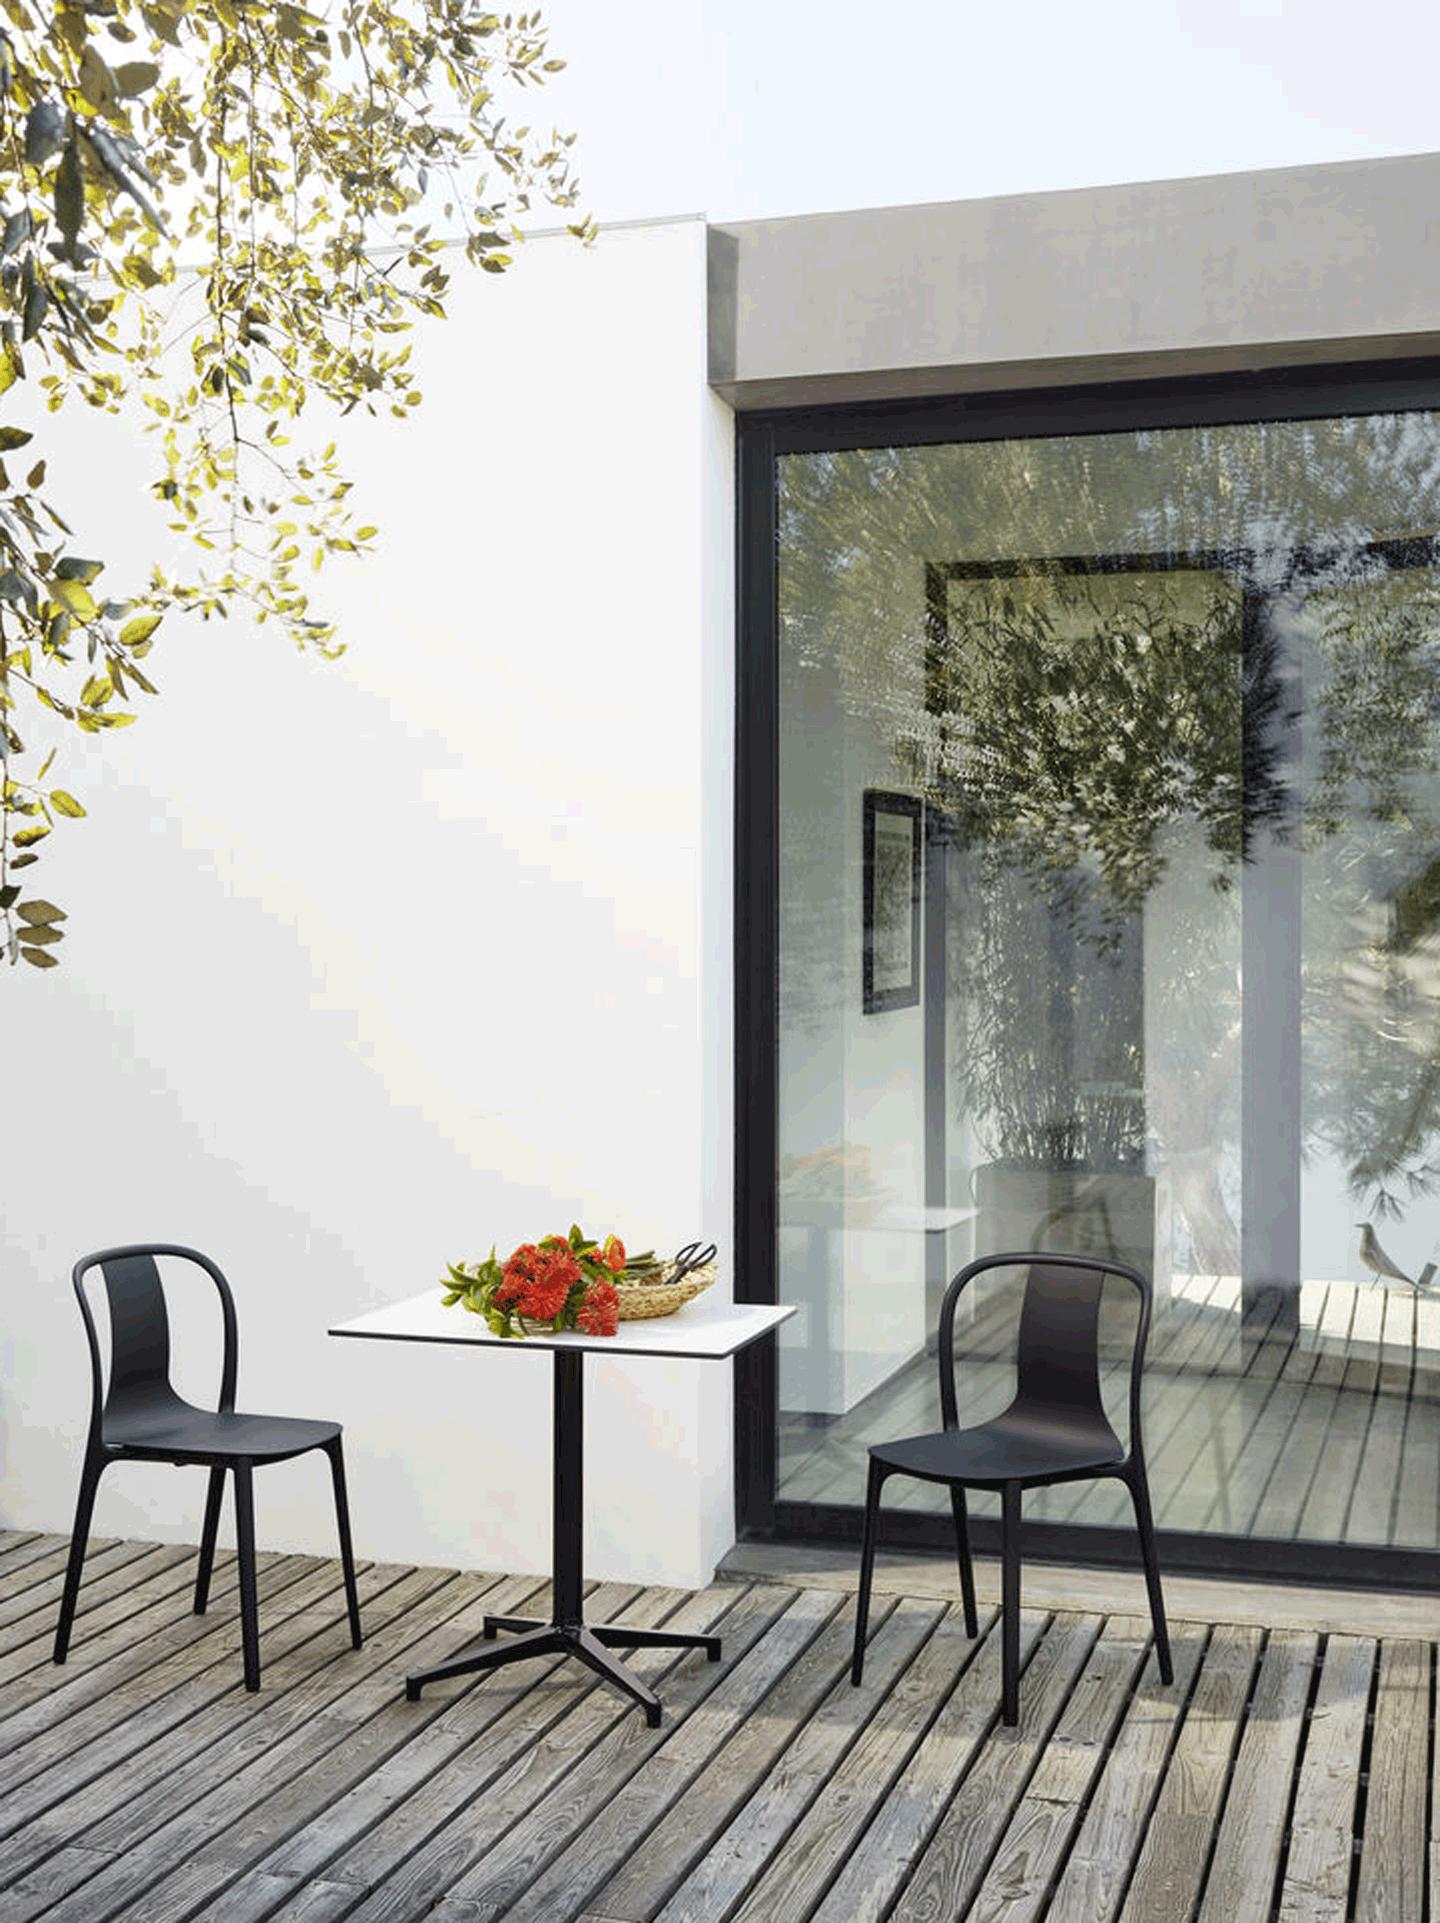 web_3348364_Belleville-Bistro-Table-Eames-House-bird_v_fullbleed_1440x